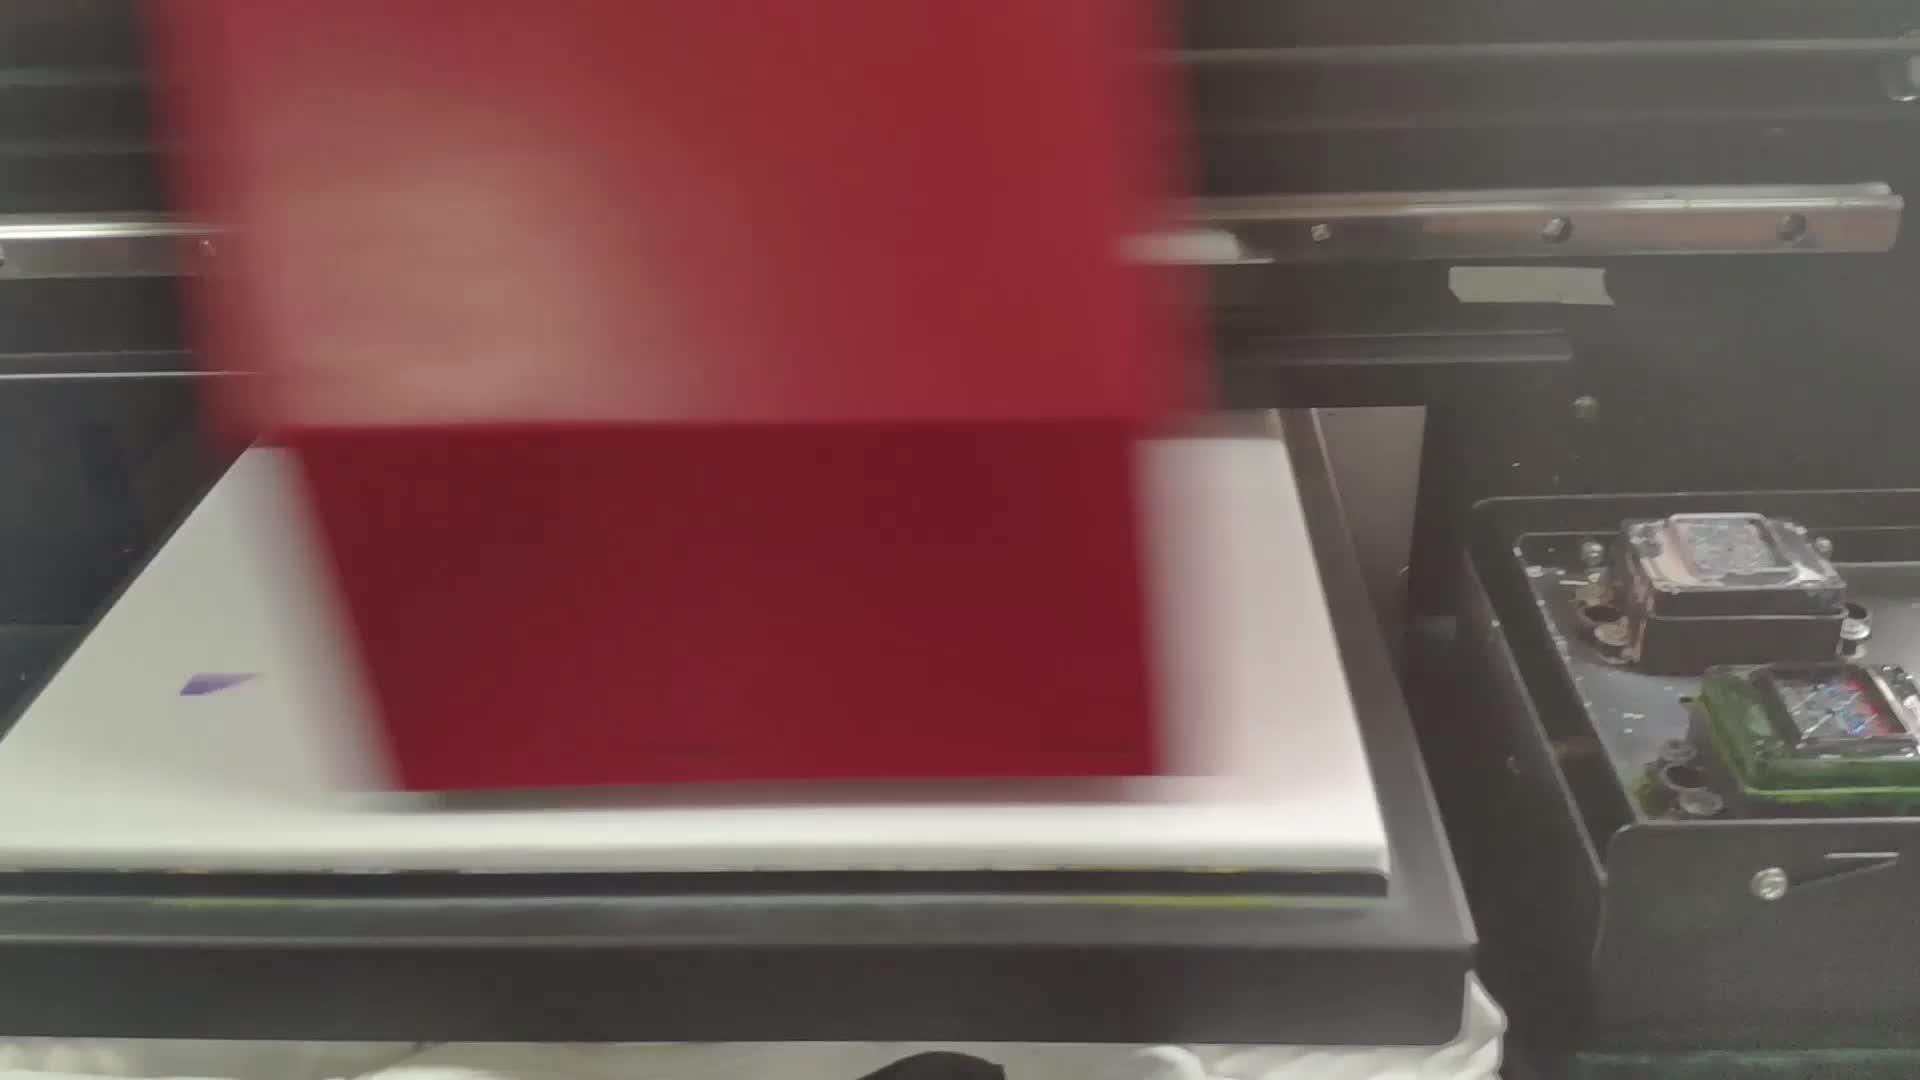 Refinecolor Nieuwe ontwerp shirts printer prijs/3d t-shirt drukmachine/katoenen t-shirt digitale printer printer